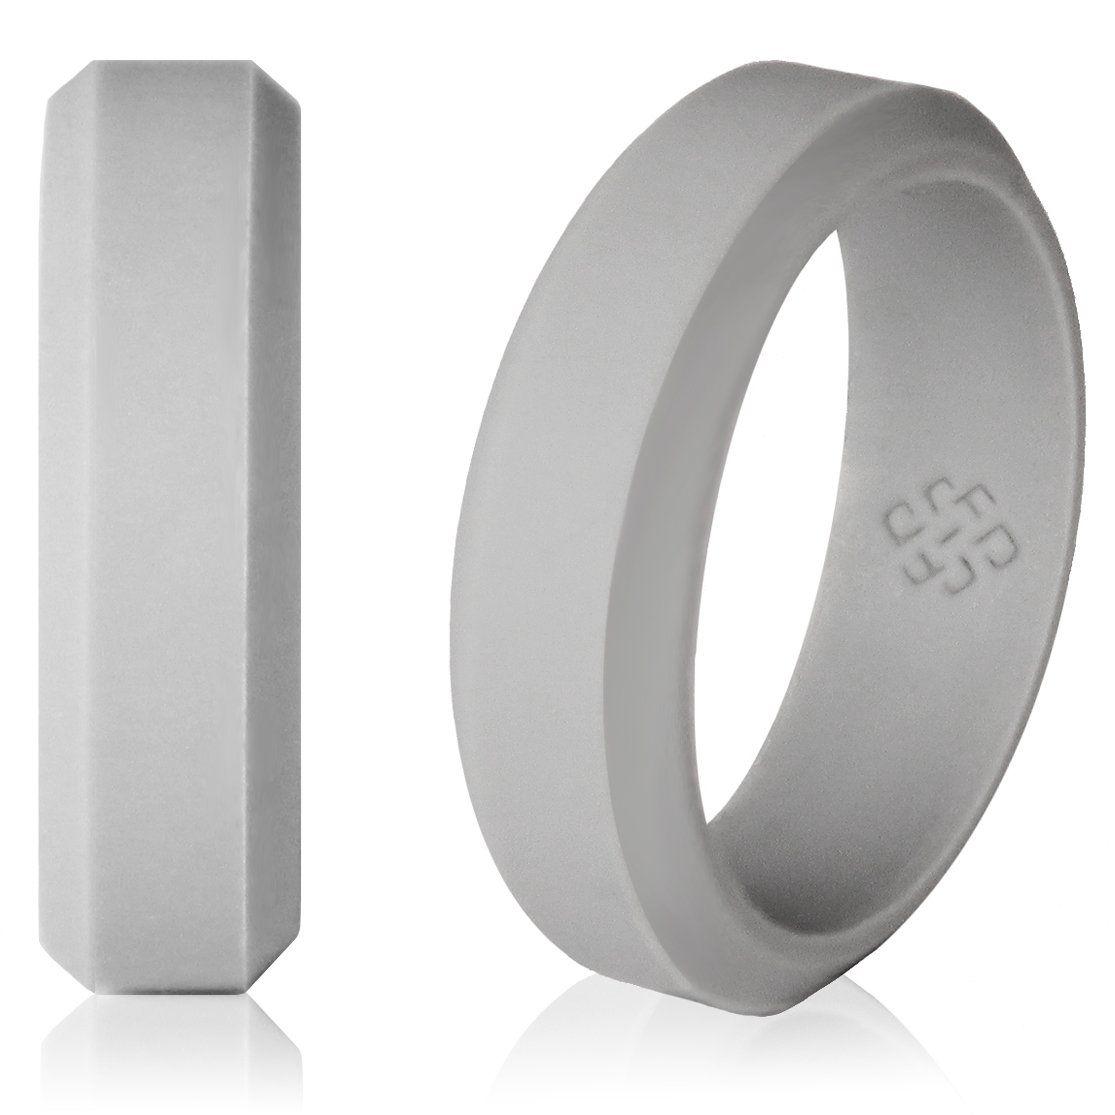 Light Gray Silicone Wedding Ring! Modern Beveled Design